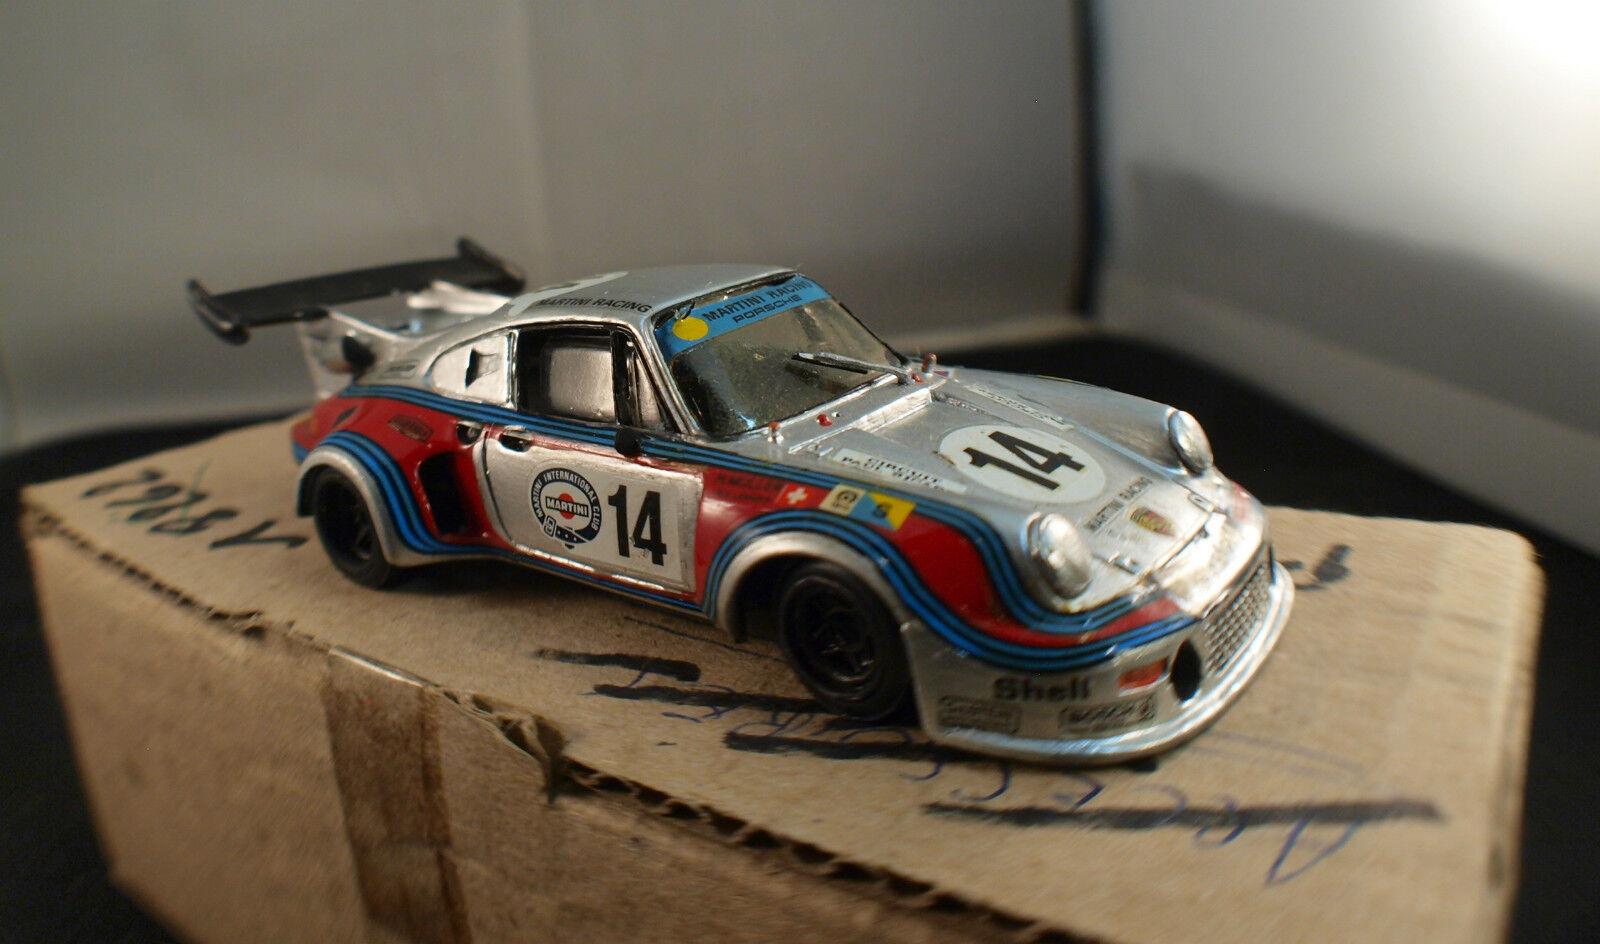 F.D.S ◊ Porsche Carrera Carrera Carrera RSR Turbo 1974  ◊  H.Muller G.V Lenner Swiss team 1 43 ◊ 4bc18b